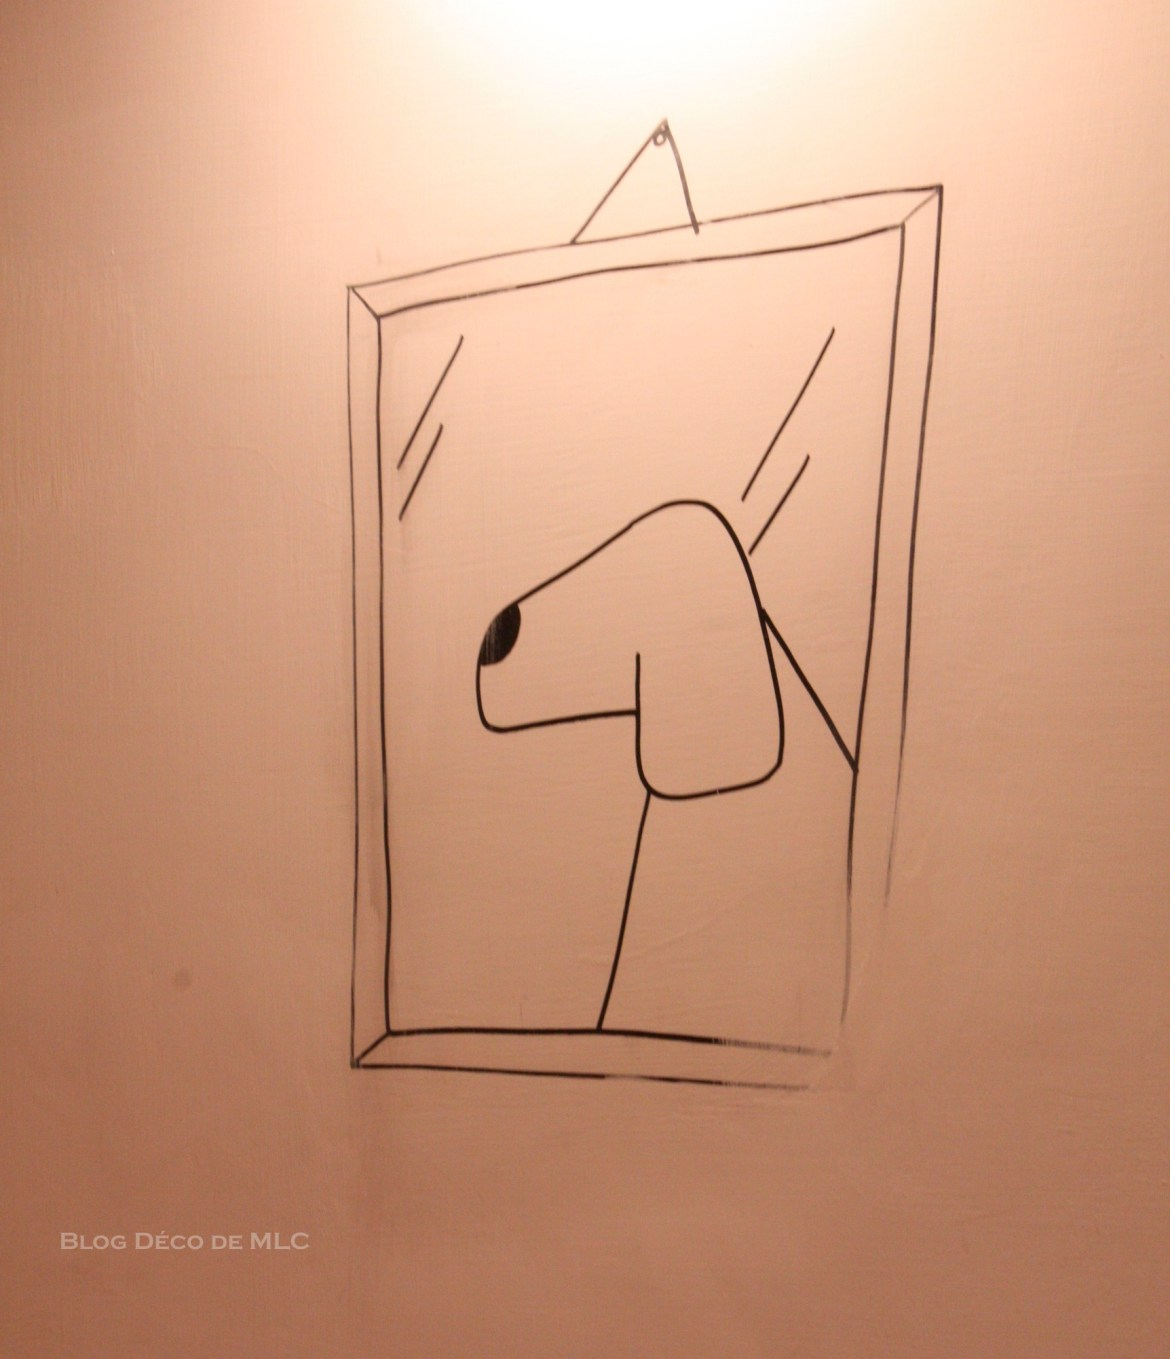 tableau-chien-Bellini-cocchia-blog_deco_MLC